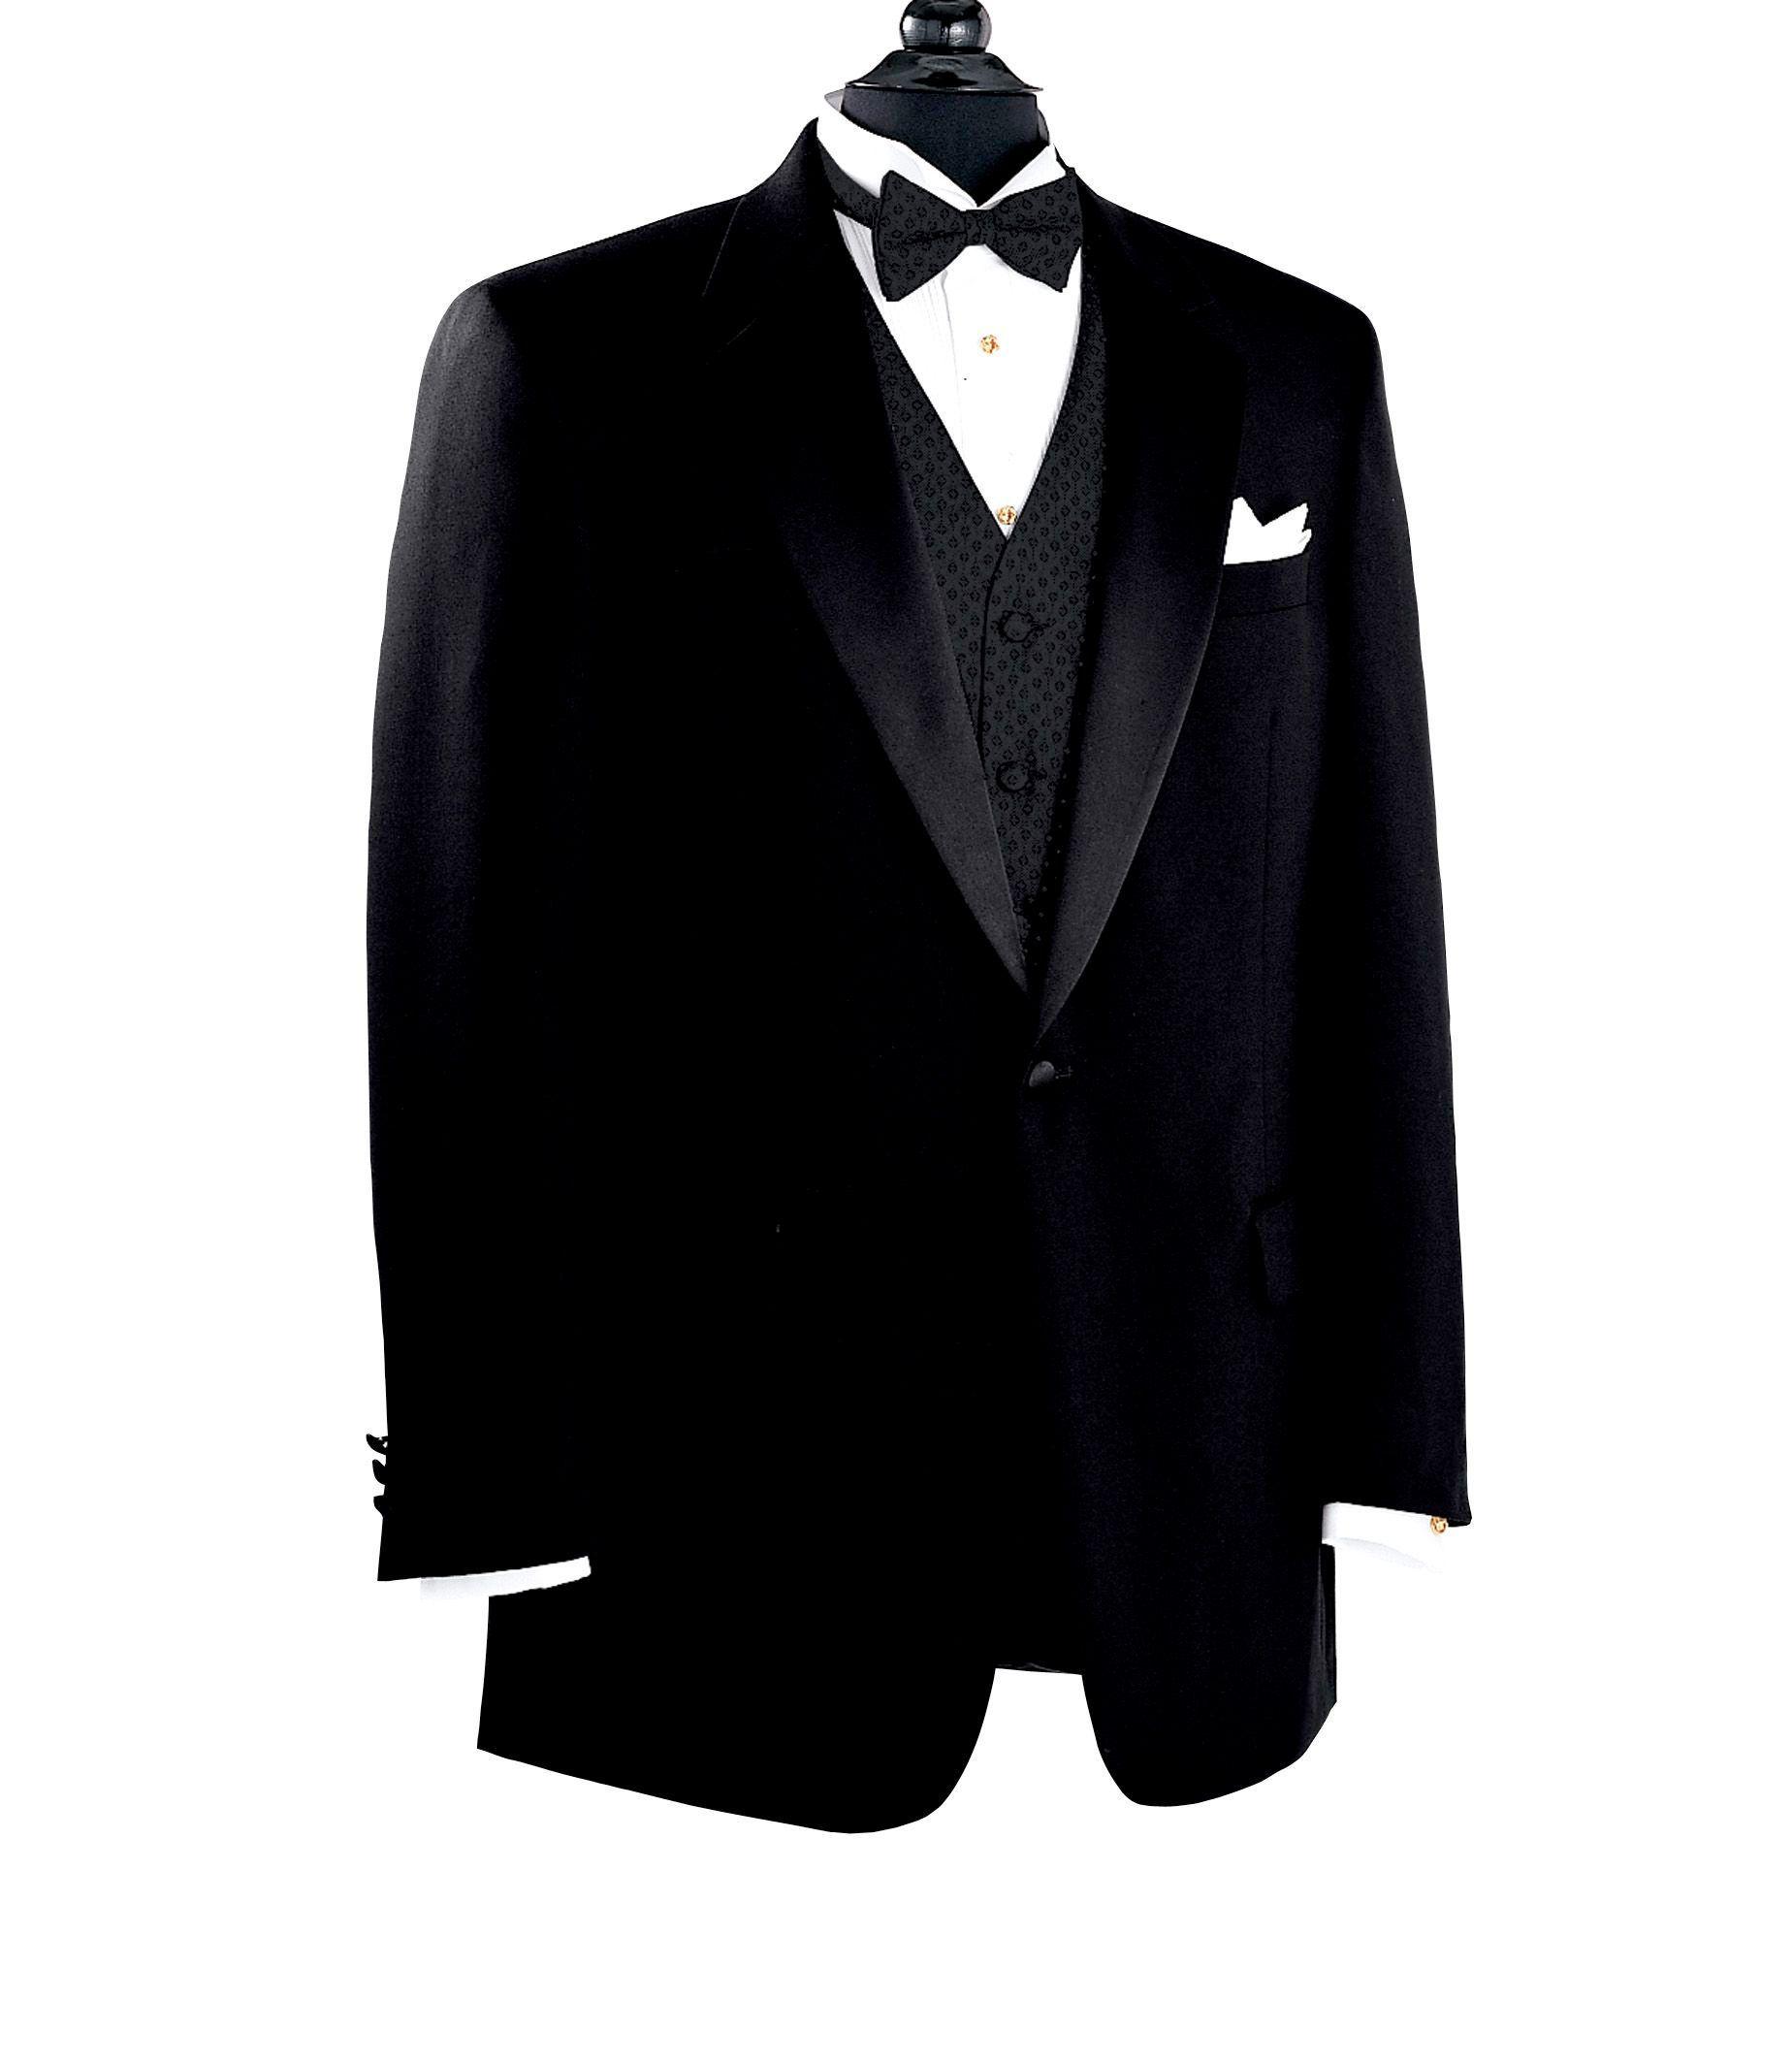 enjoy best price fresh styles offer discounts Black Notch Collar Tuxedo Jacket CLEARANCE